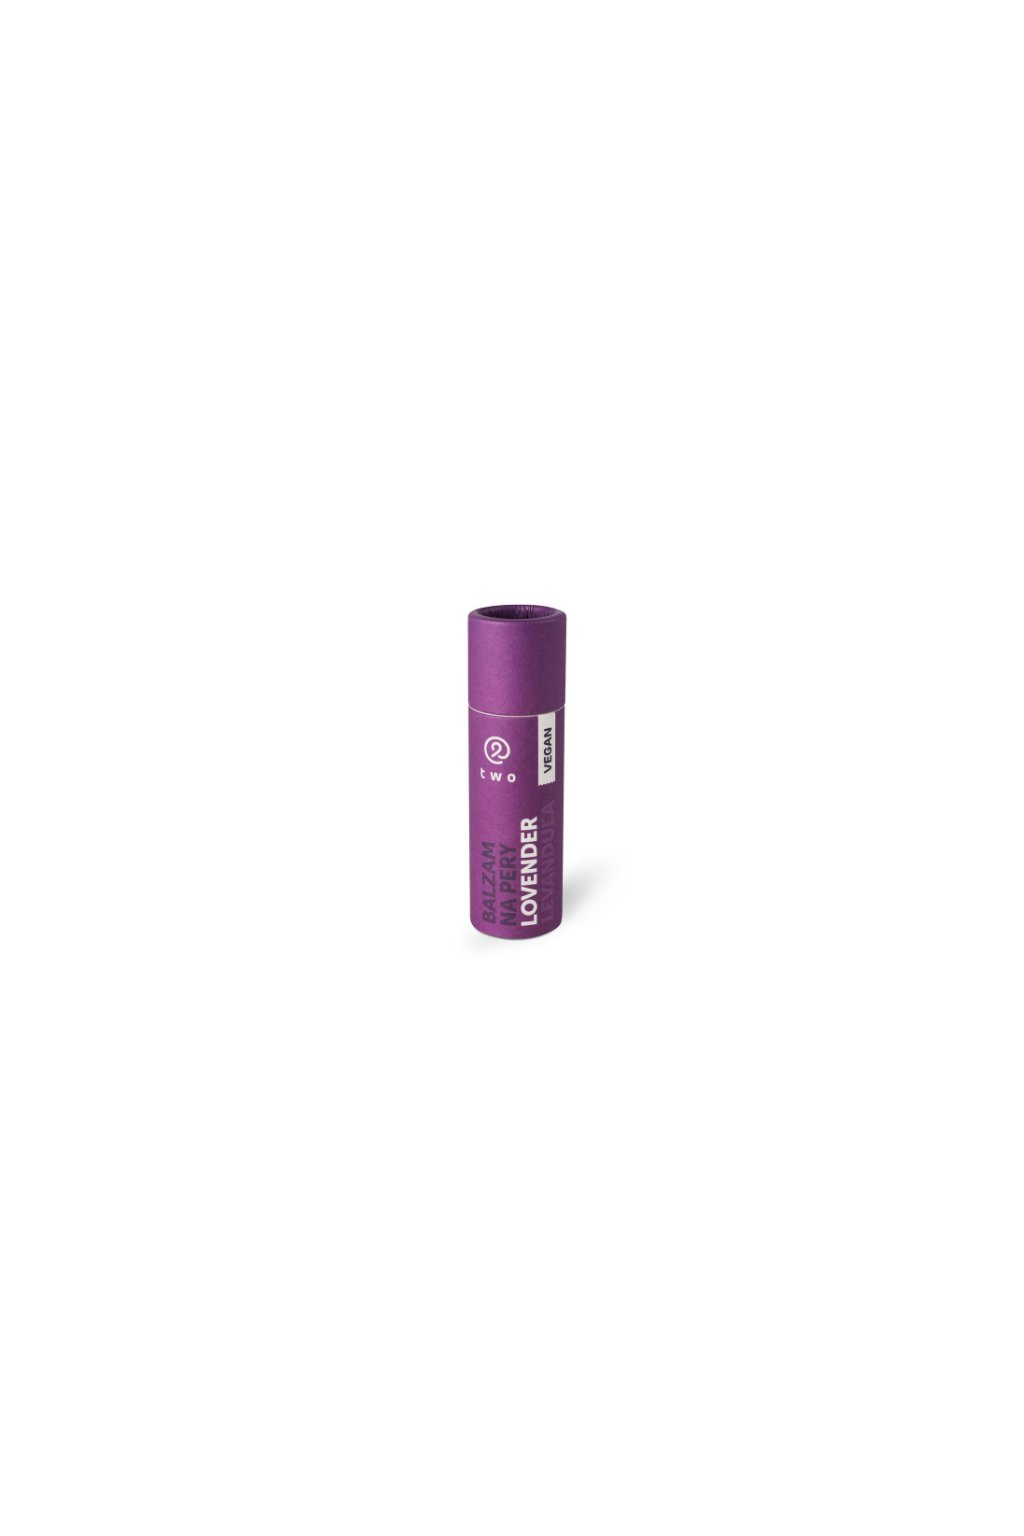 10343 two cosmetics balzam na rty v tycince lovender levandule 10 g